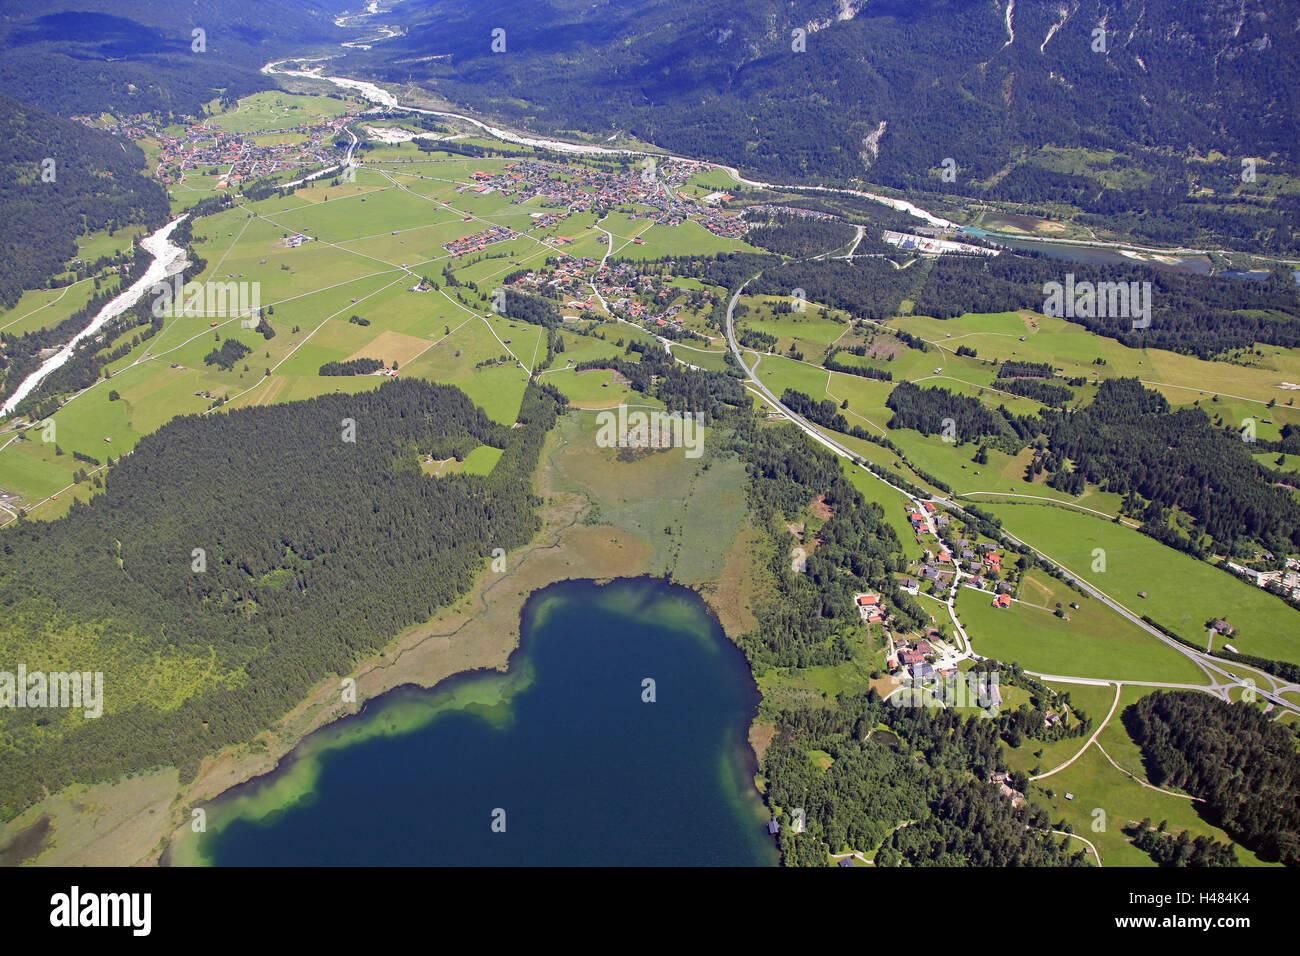 Germany, Upper Bavaria, Barmsee (lake), - Stock Image